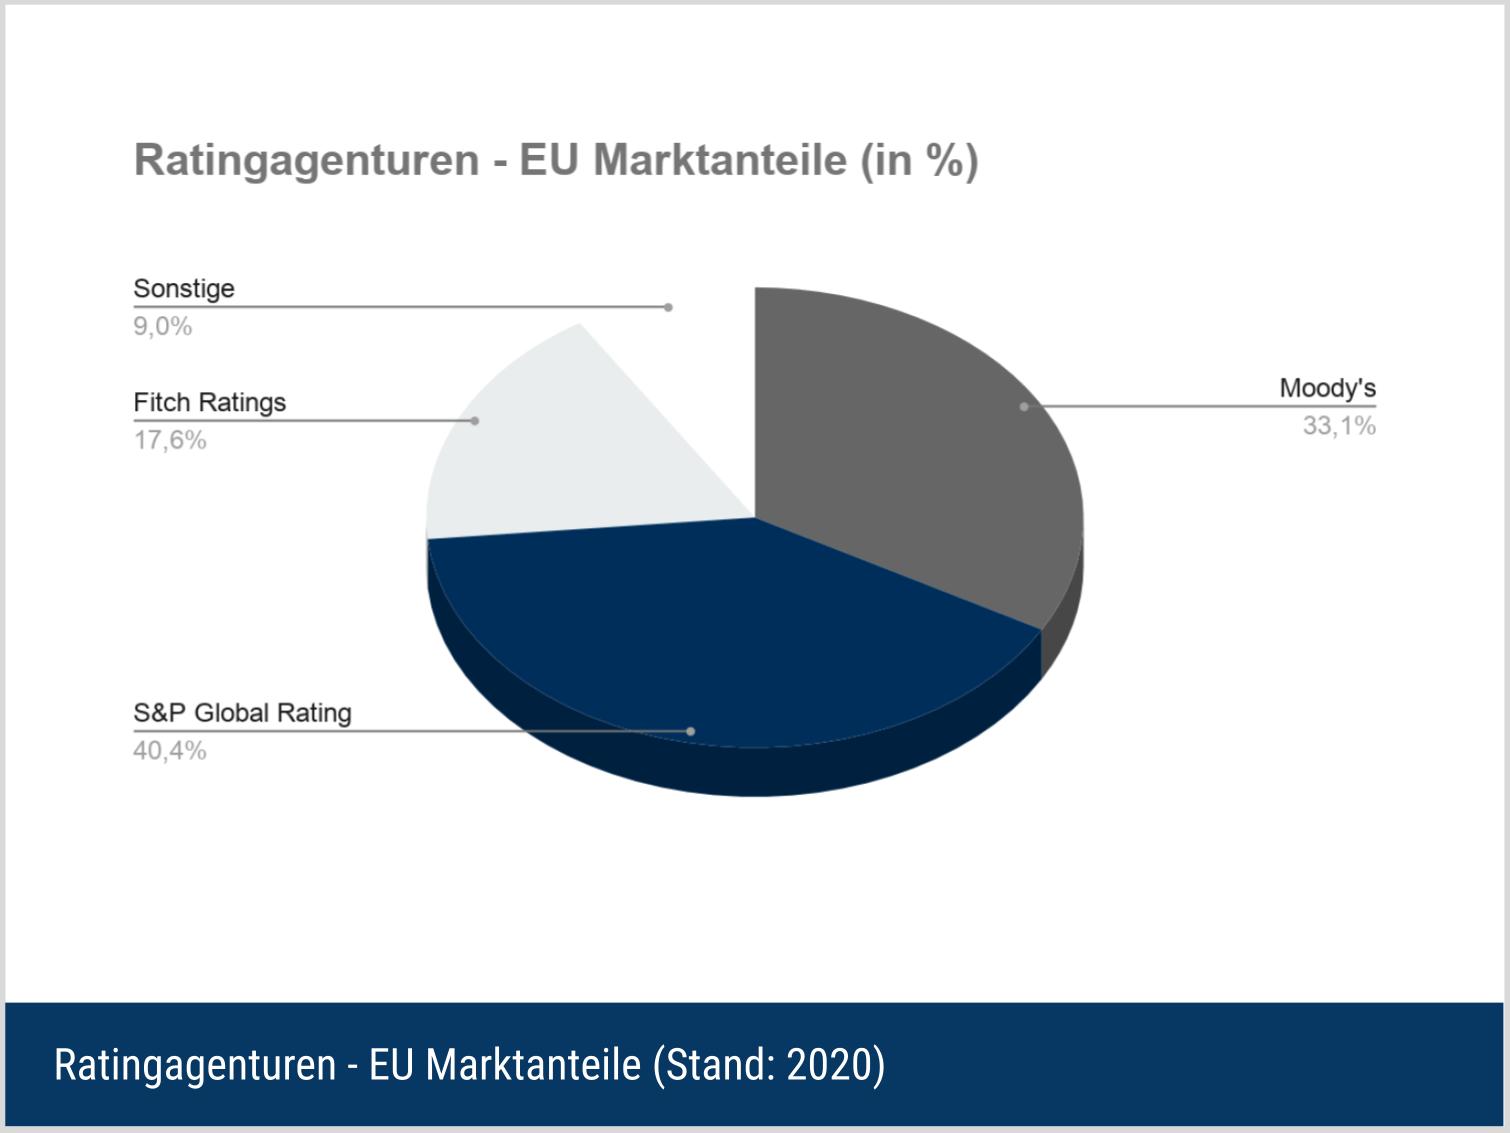 Ratingagenturen - Europäische Marktanteile